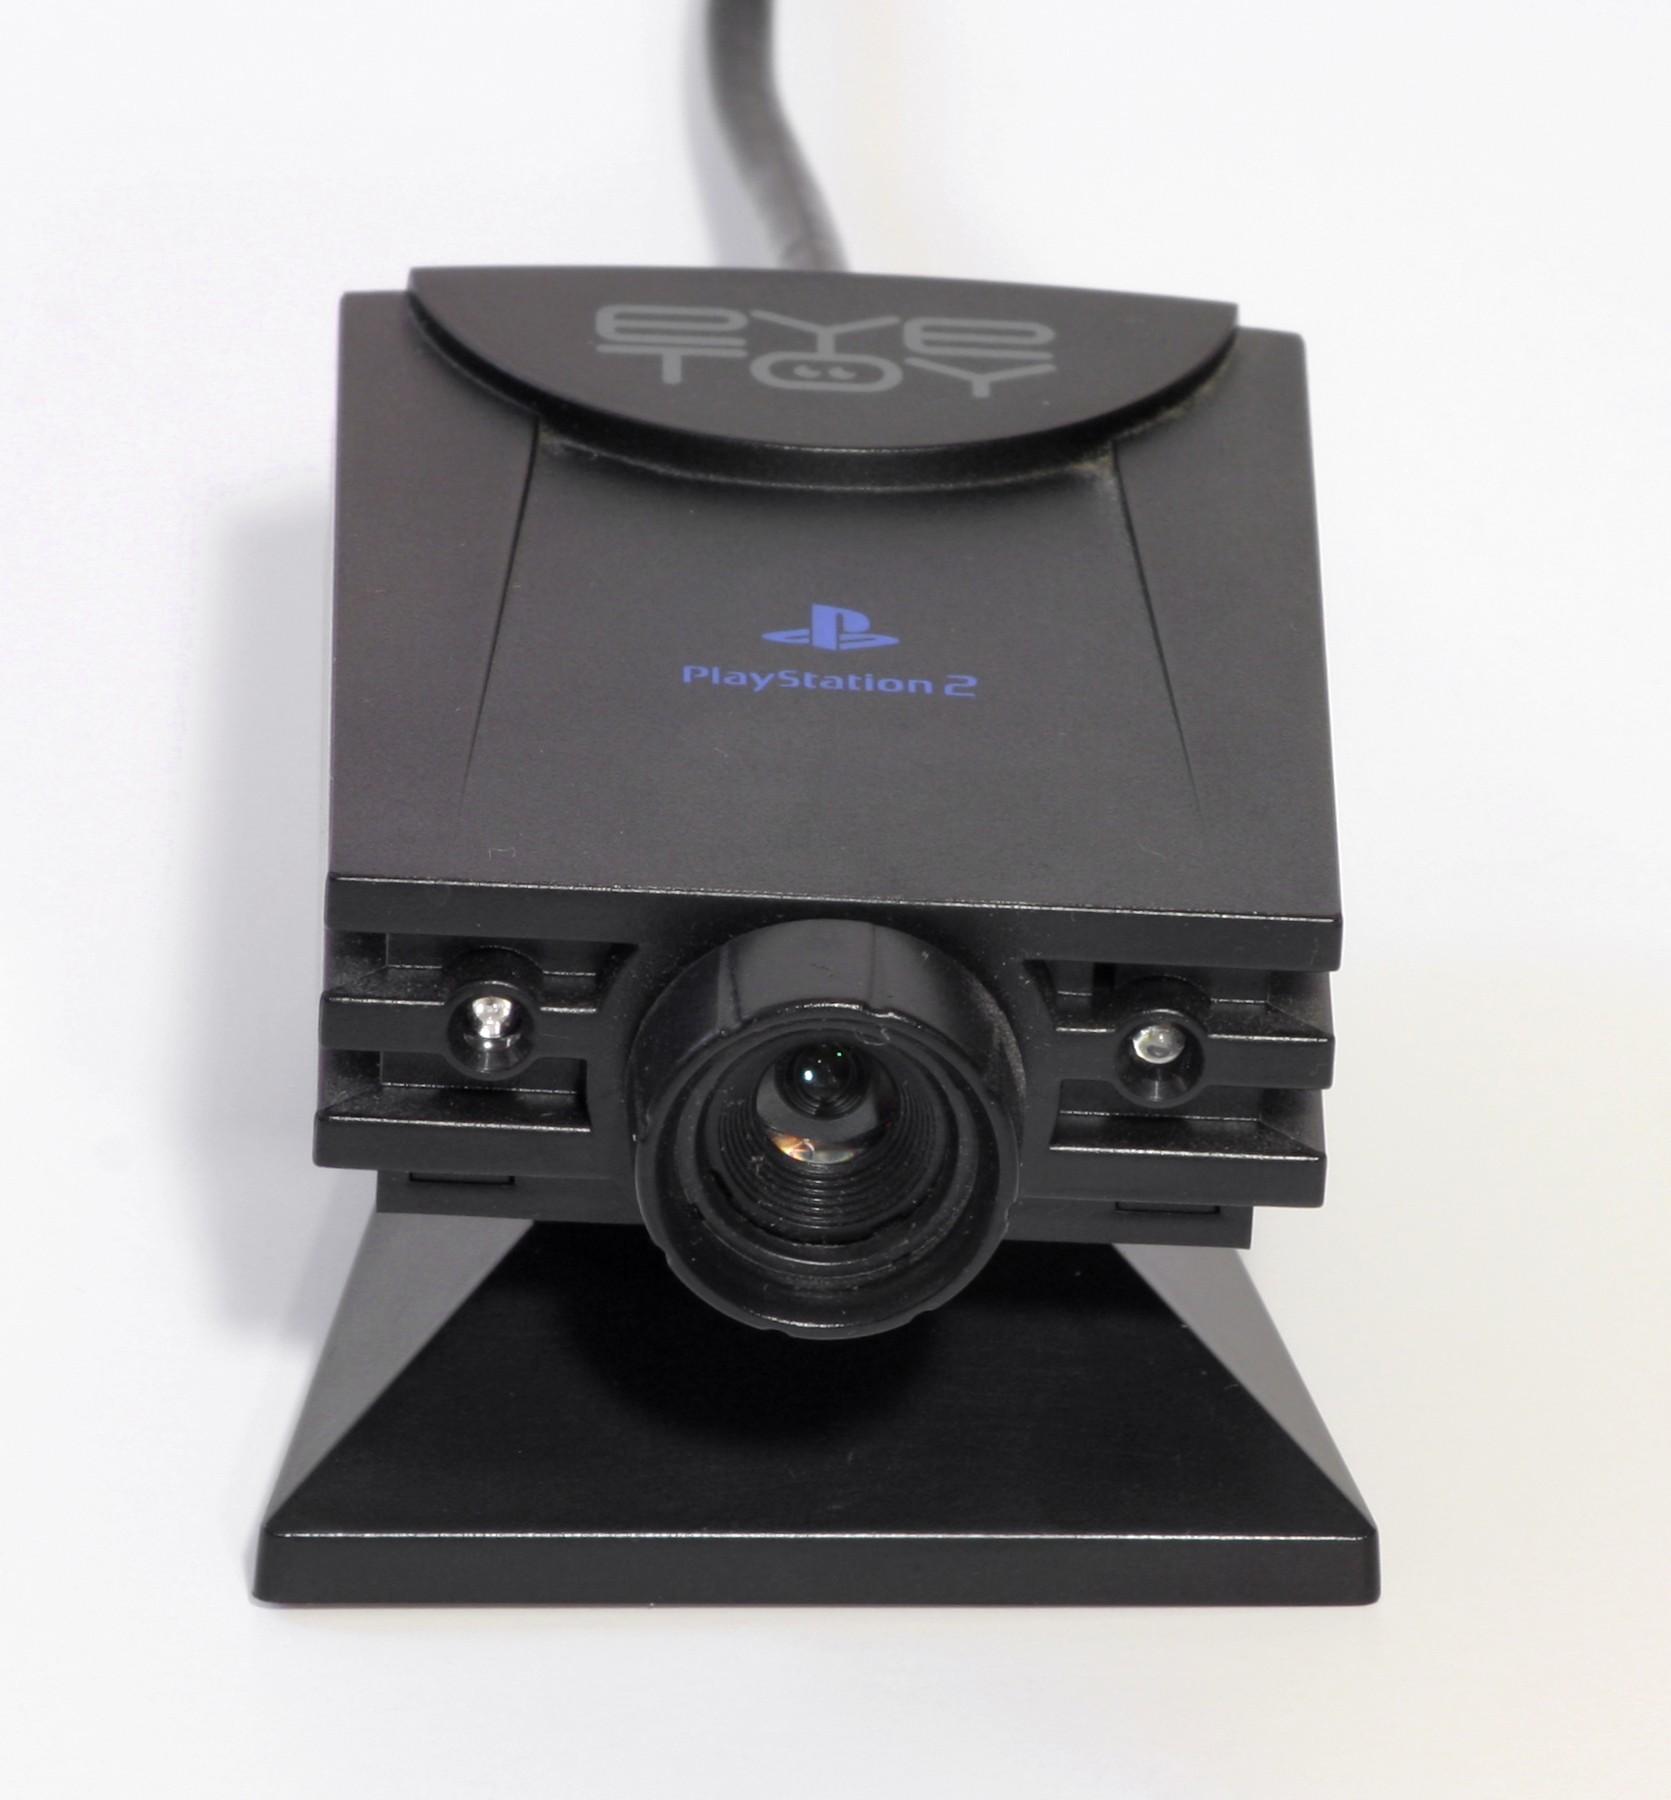 Ps2 eye toy as a webcam